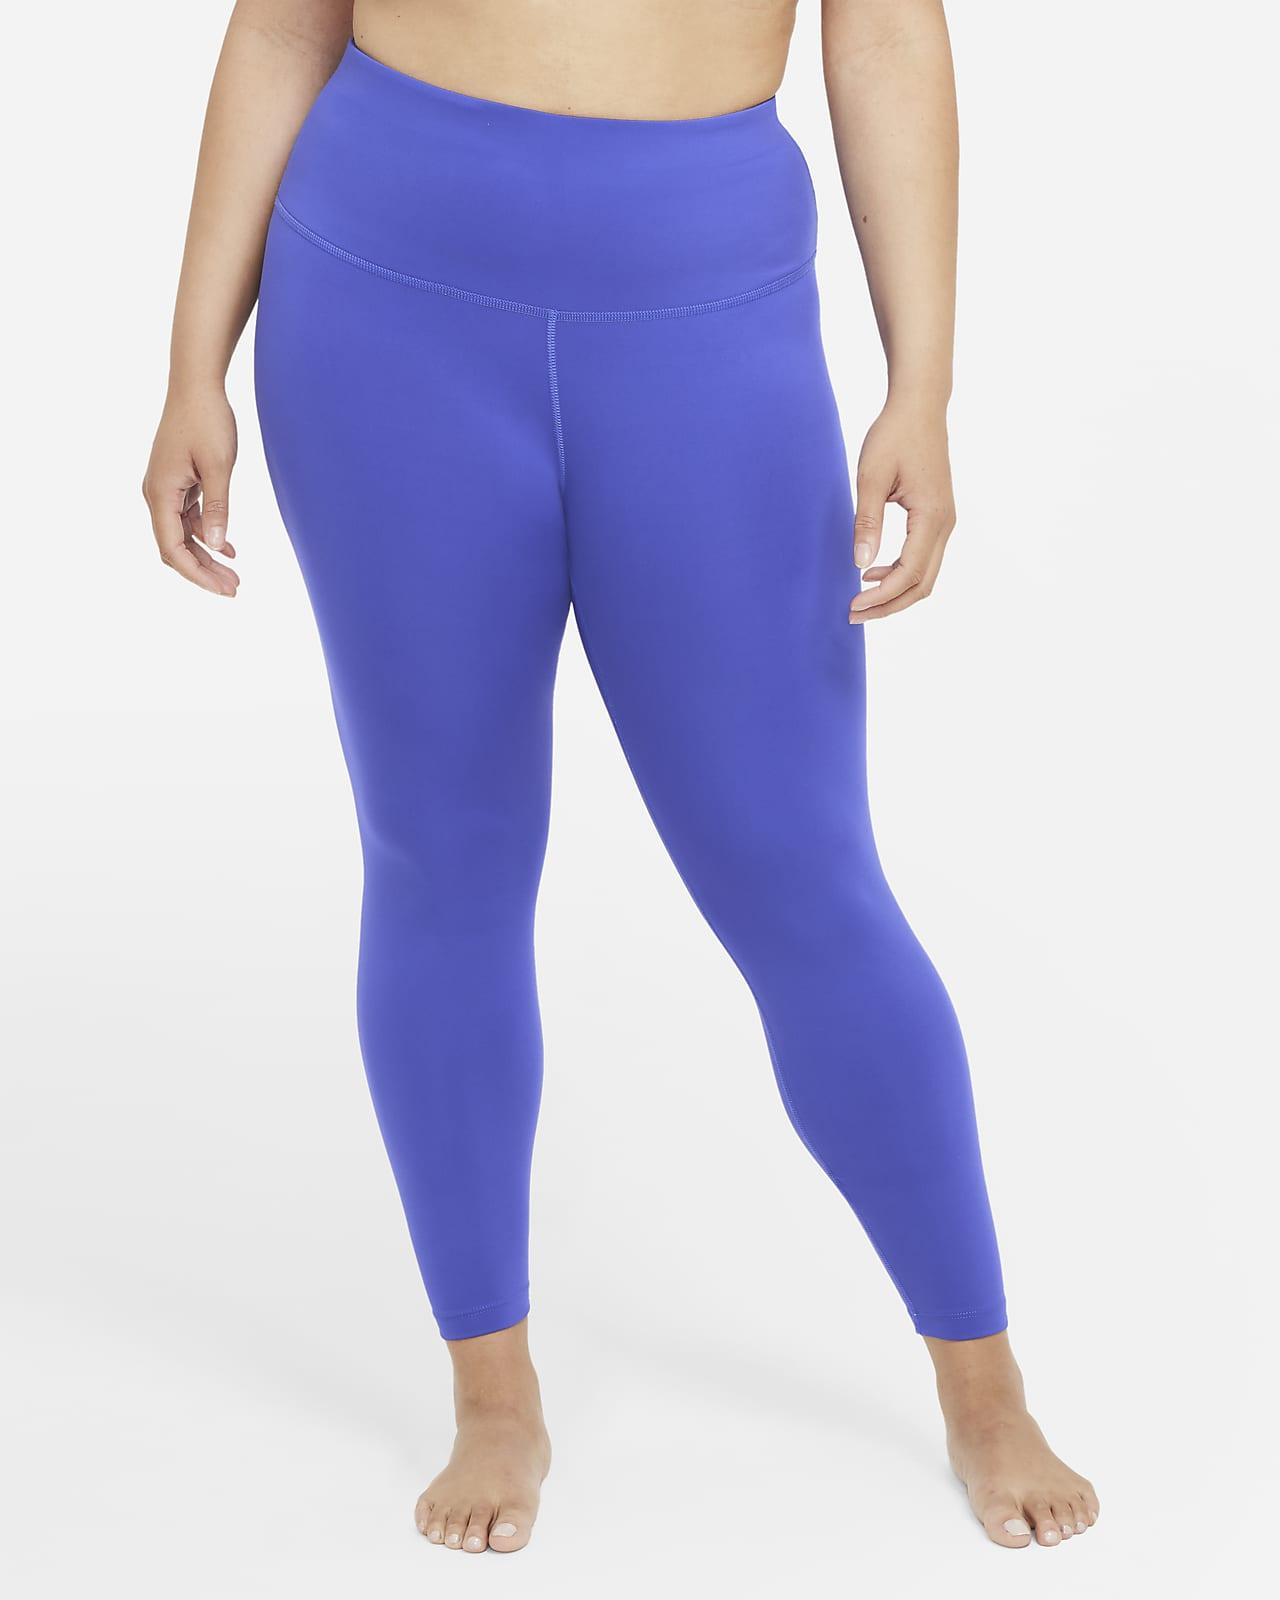 Leggings de cintura alta de 7/8 para mujer (talla grande) Nike Yoga